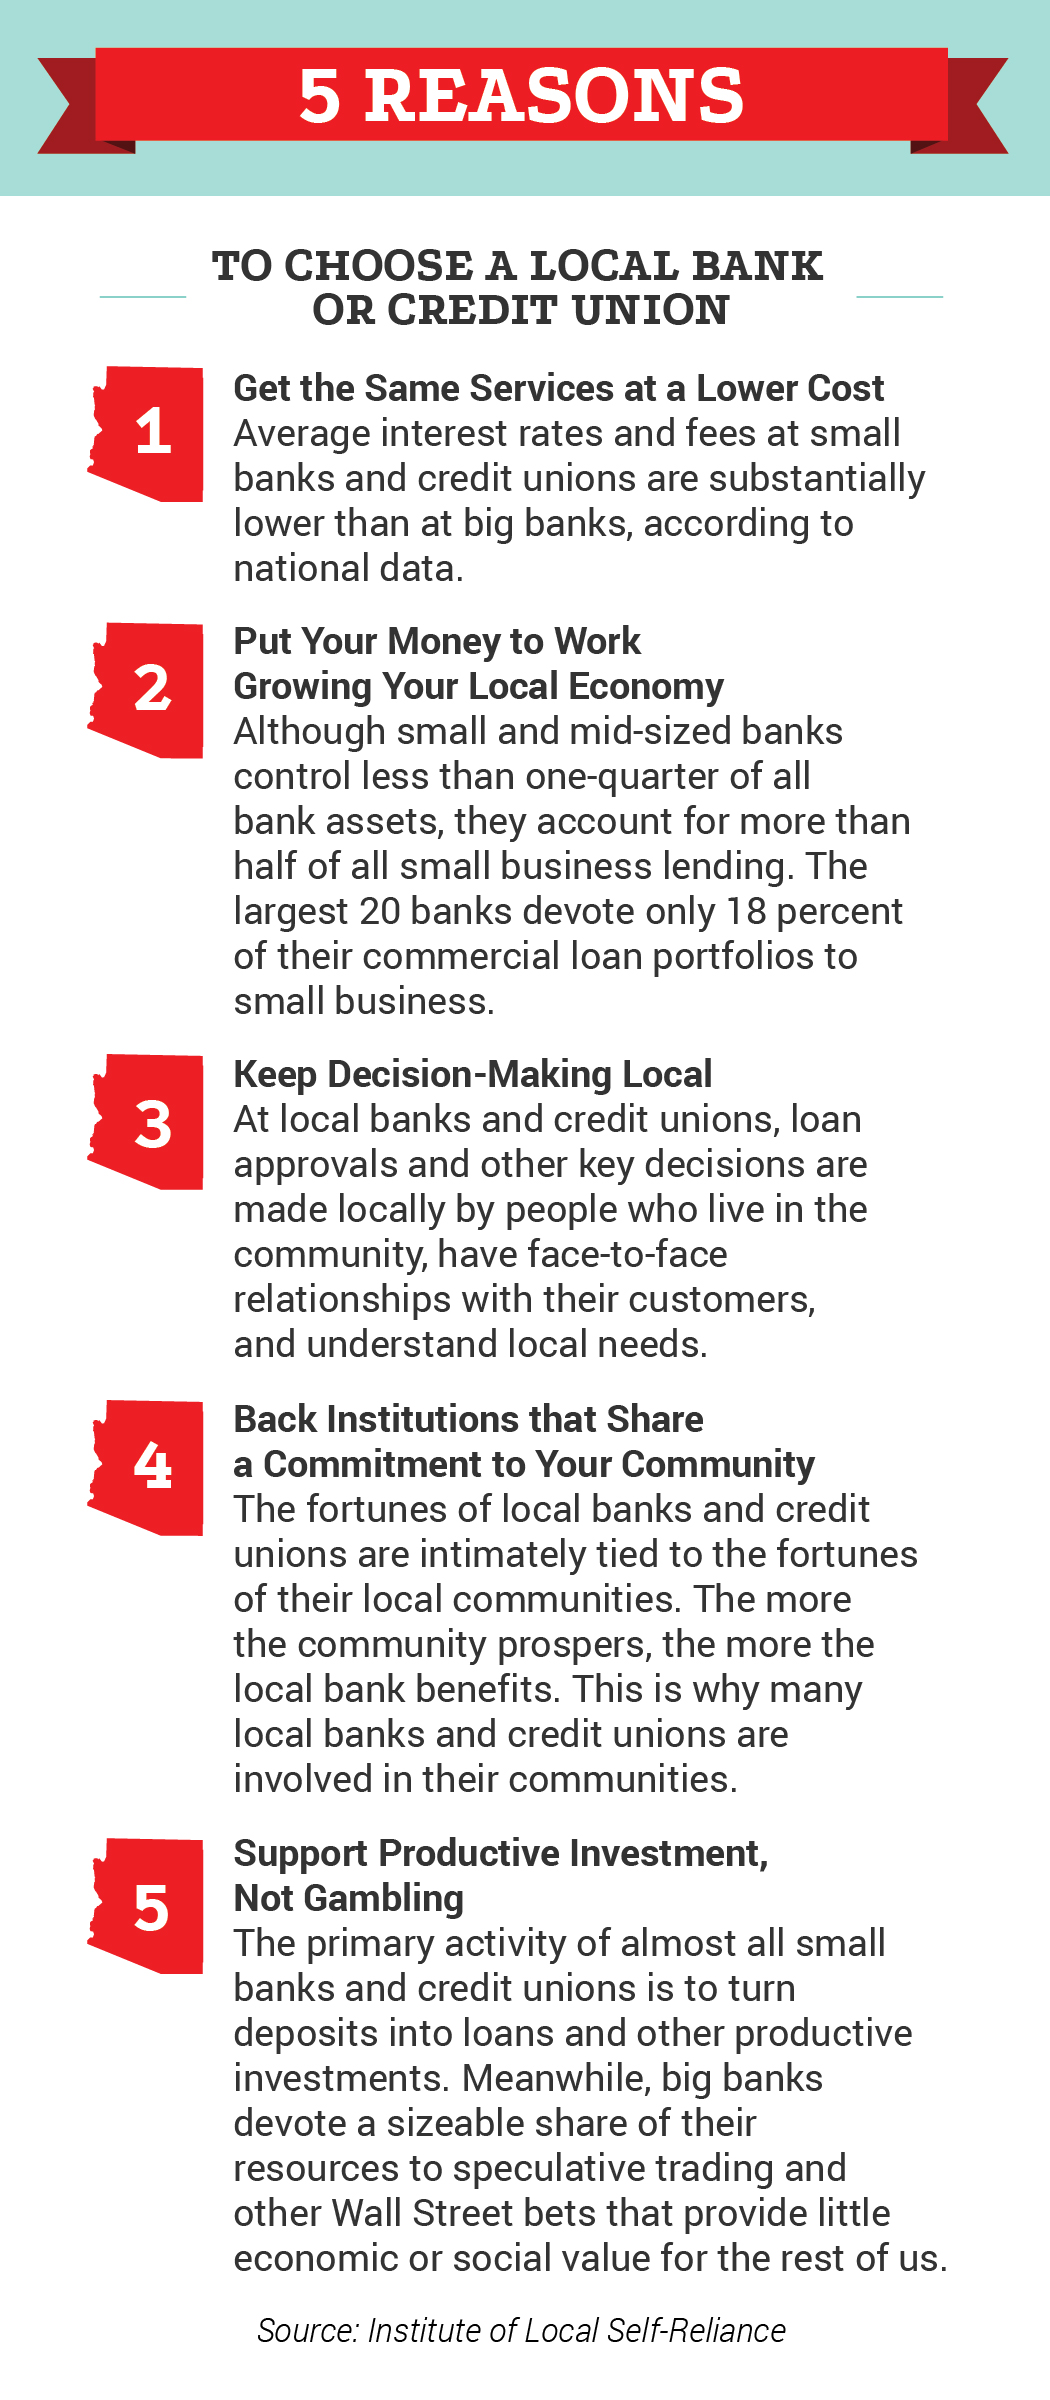 CommunityBankingMonth-2016-SMShare3